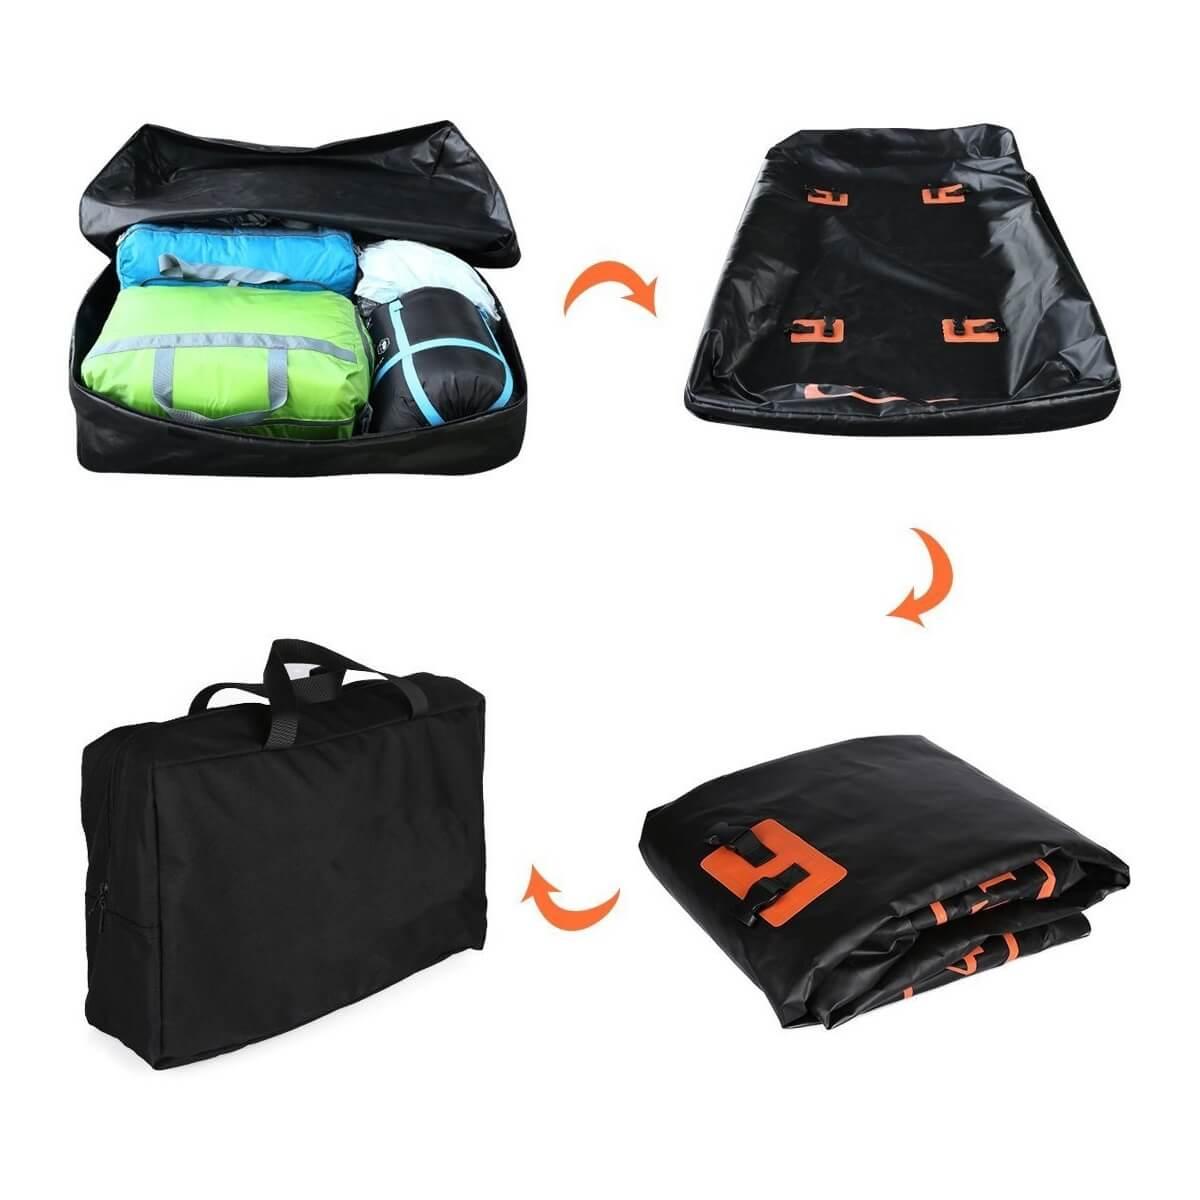 Waterproof Cargo Carrier Bag Roof Top Bag Soft Top Roof Bag Car Ro